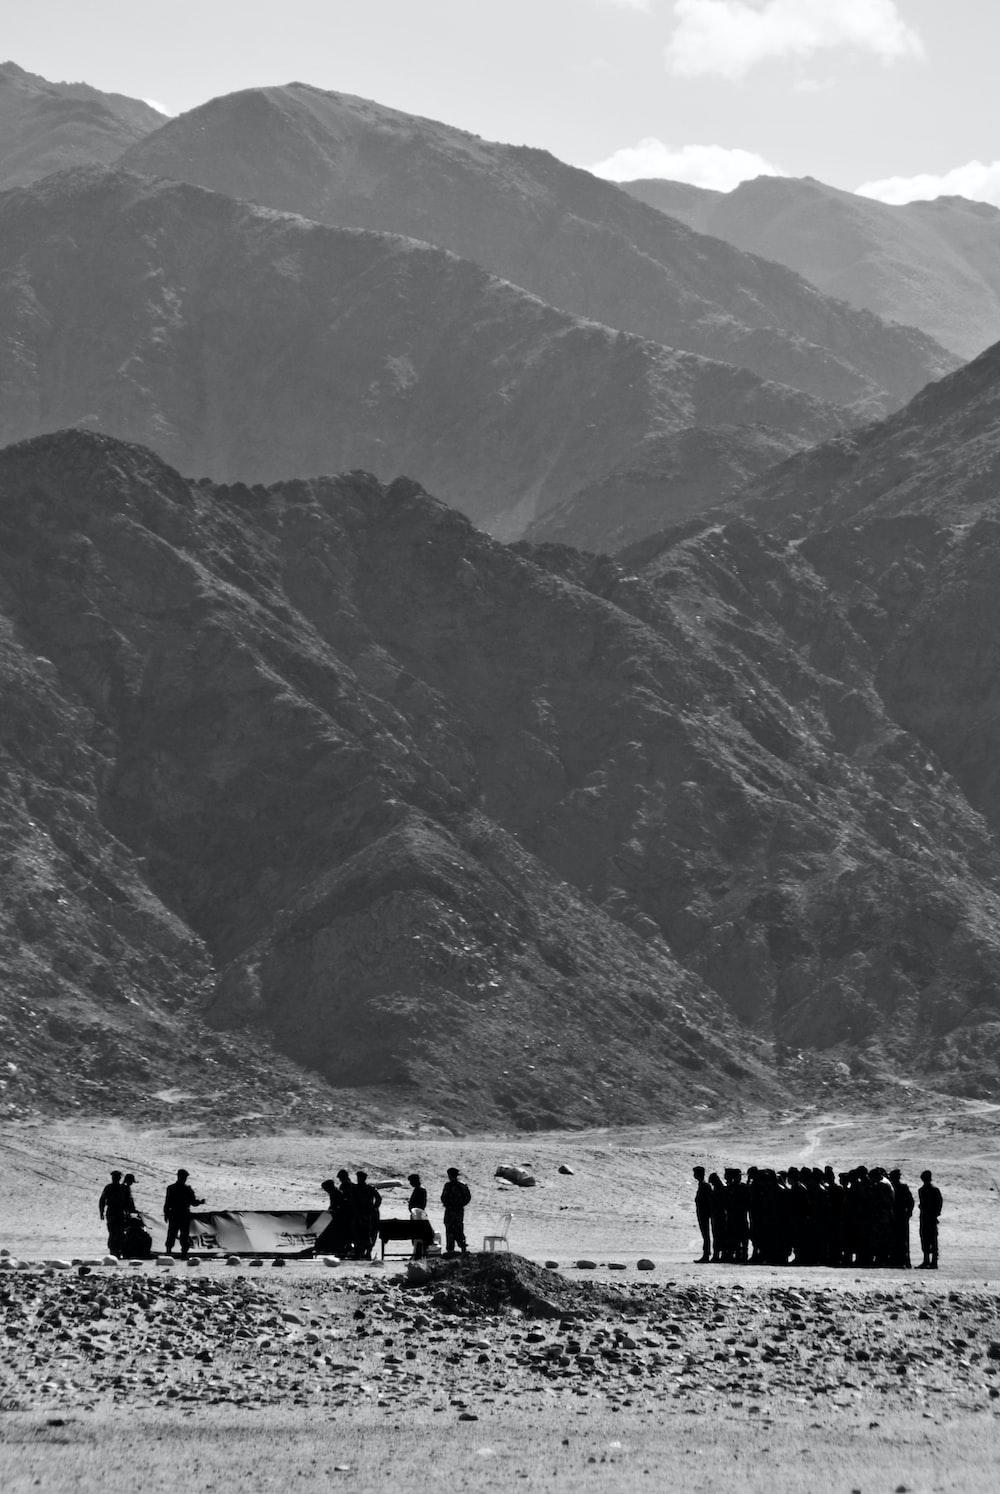 grayscale photo of people gathering near mountain